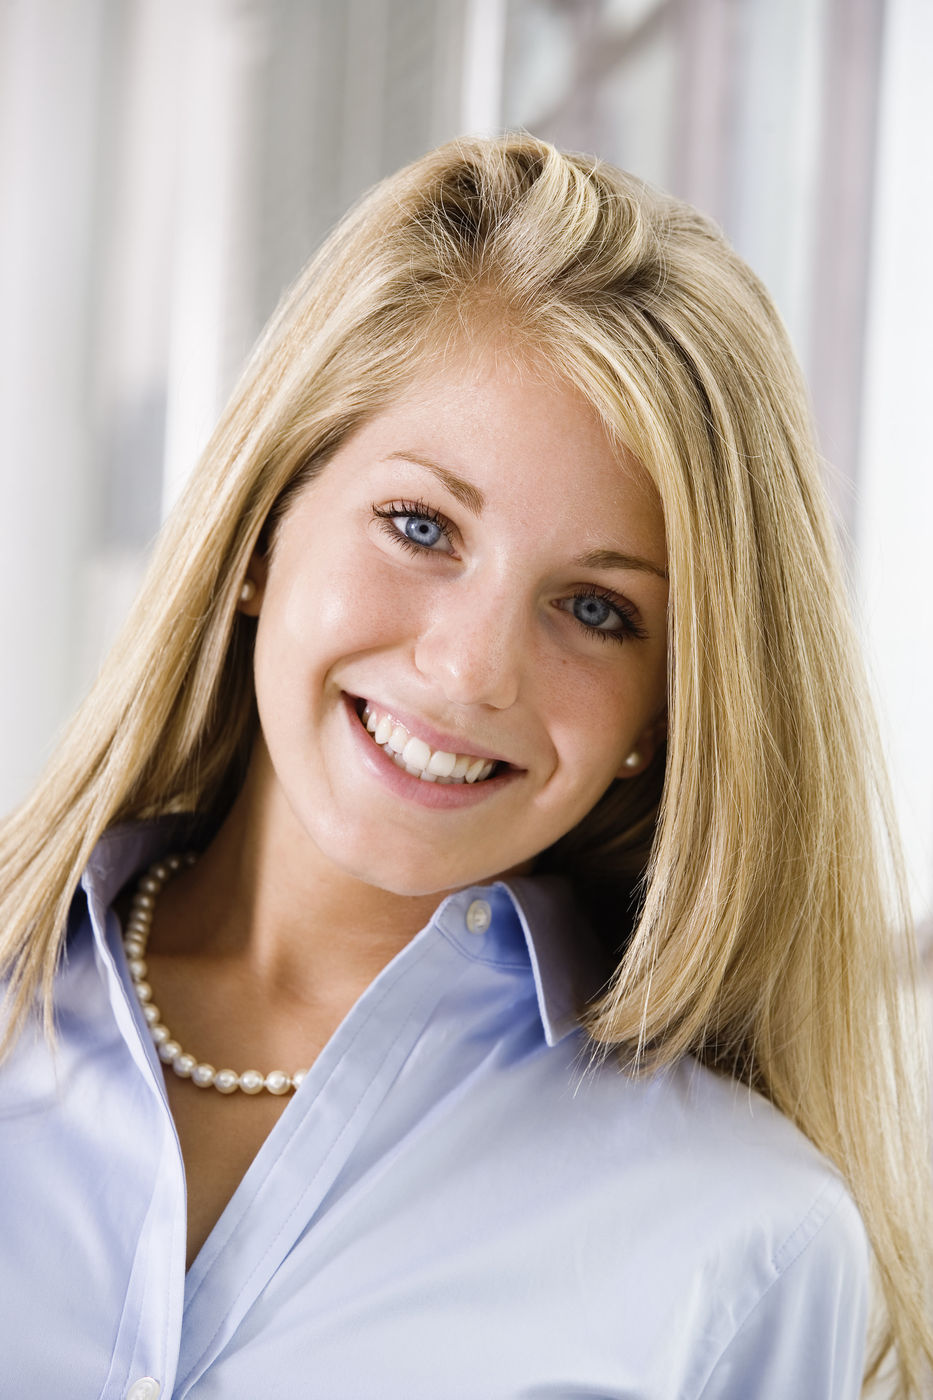 Divorced Perverted Photos Dating Blonde